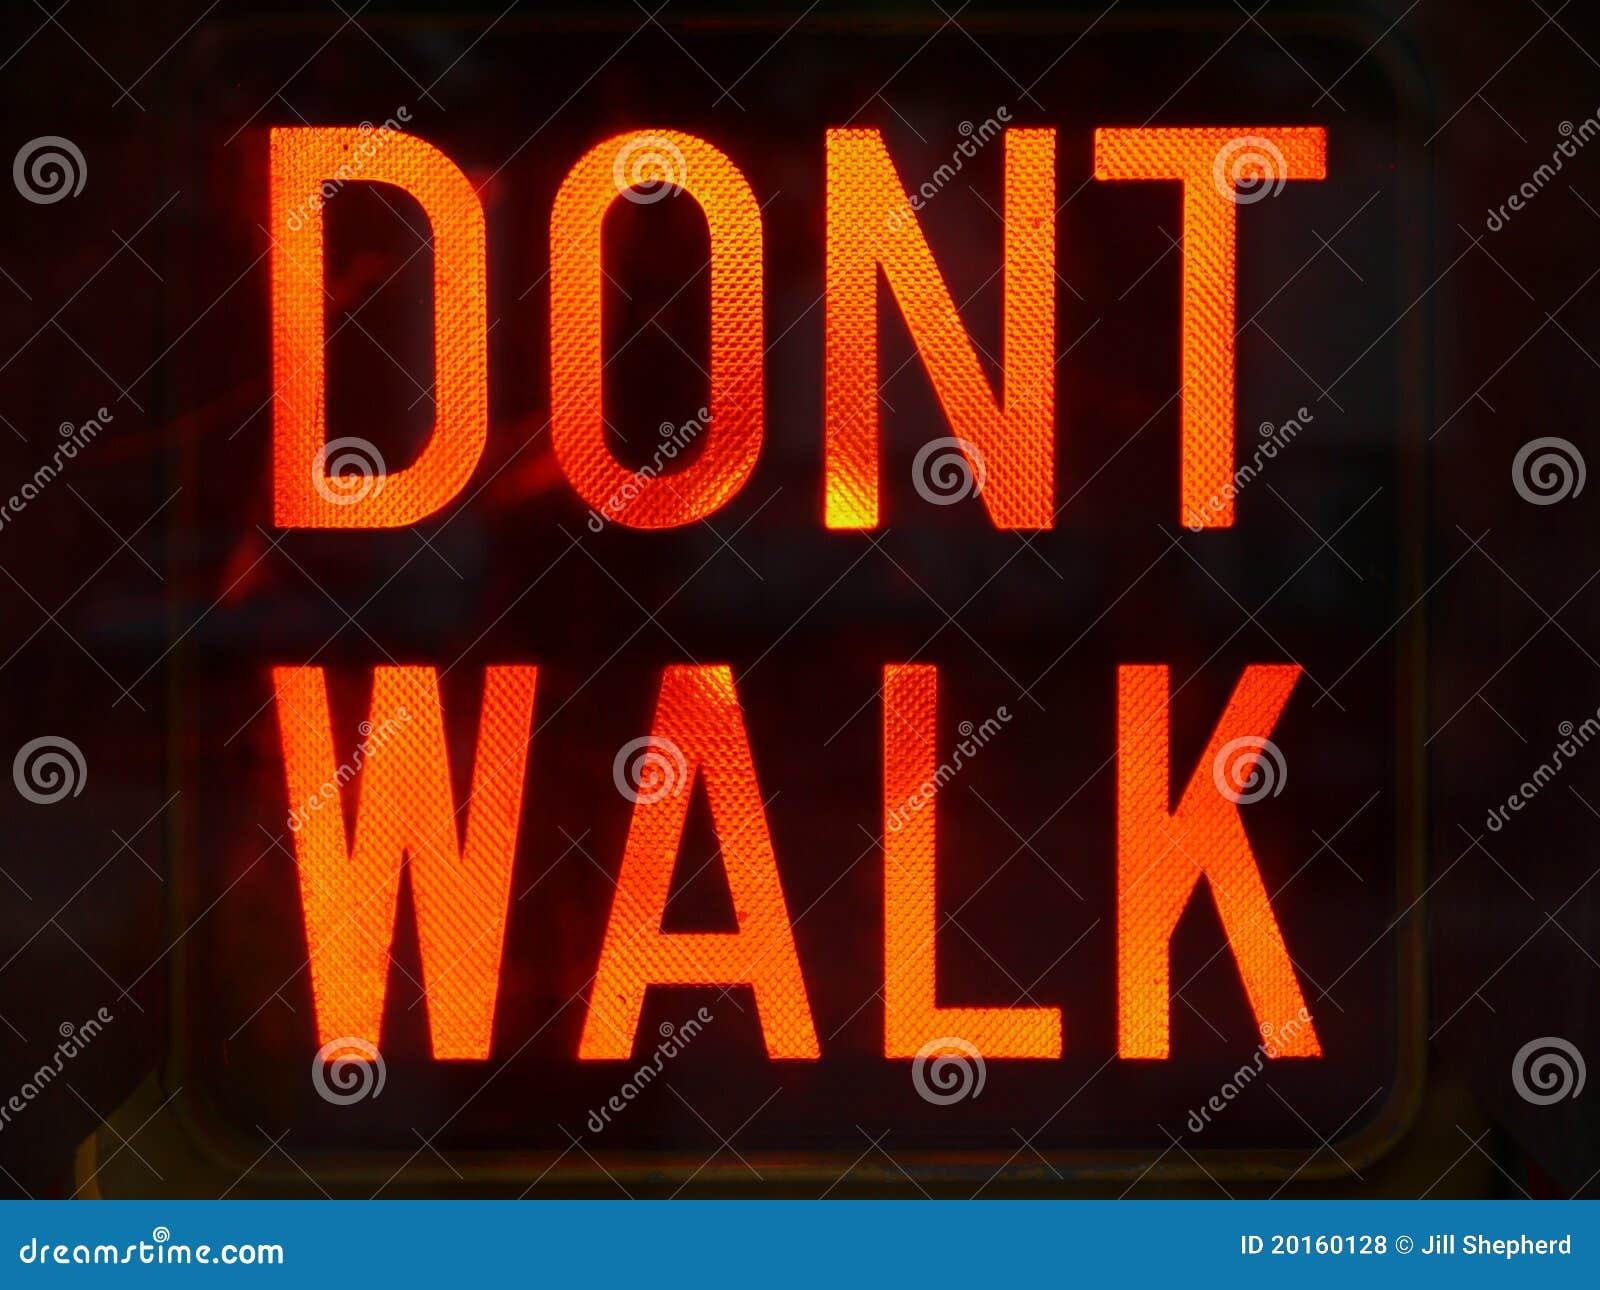 City: Dont Walk sign